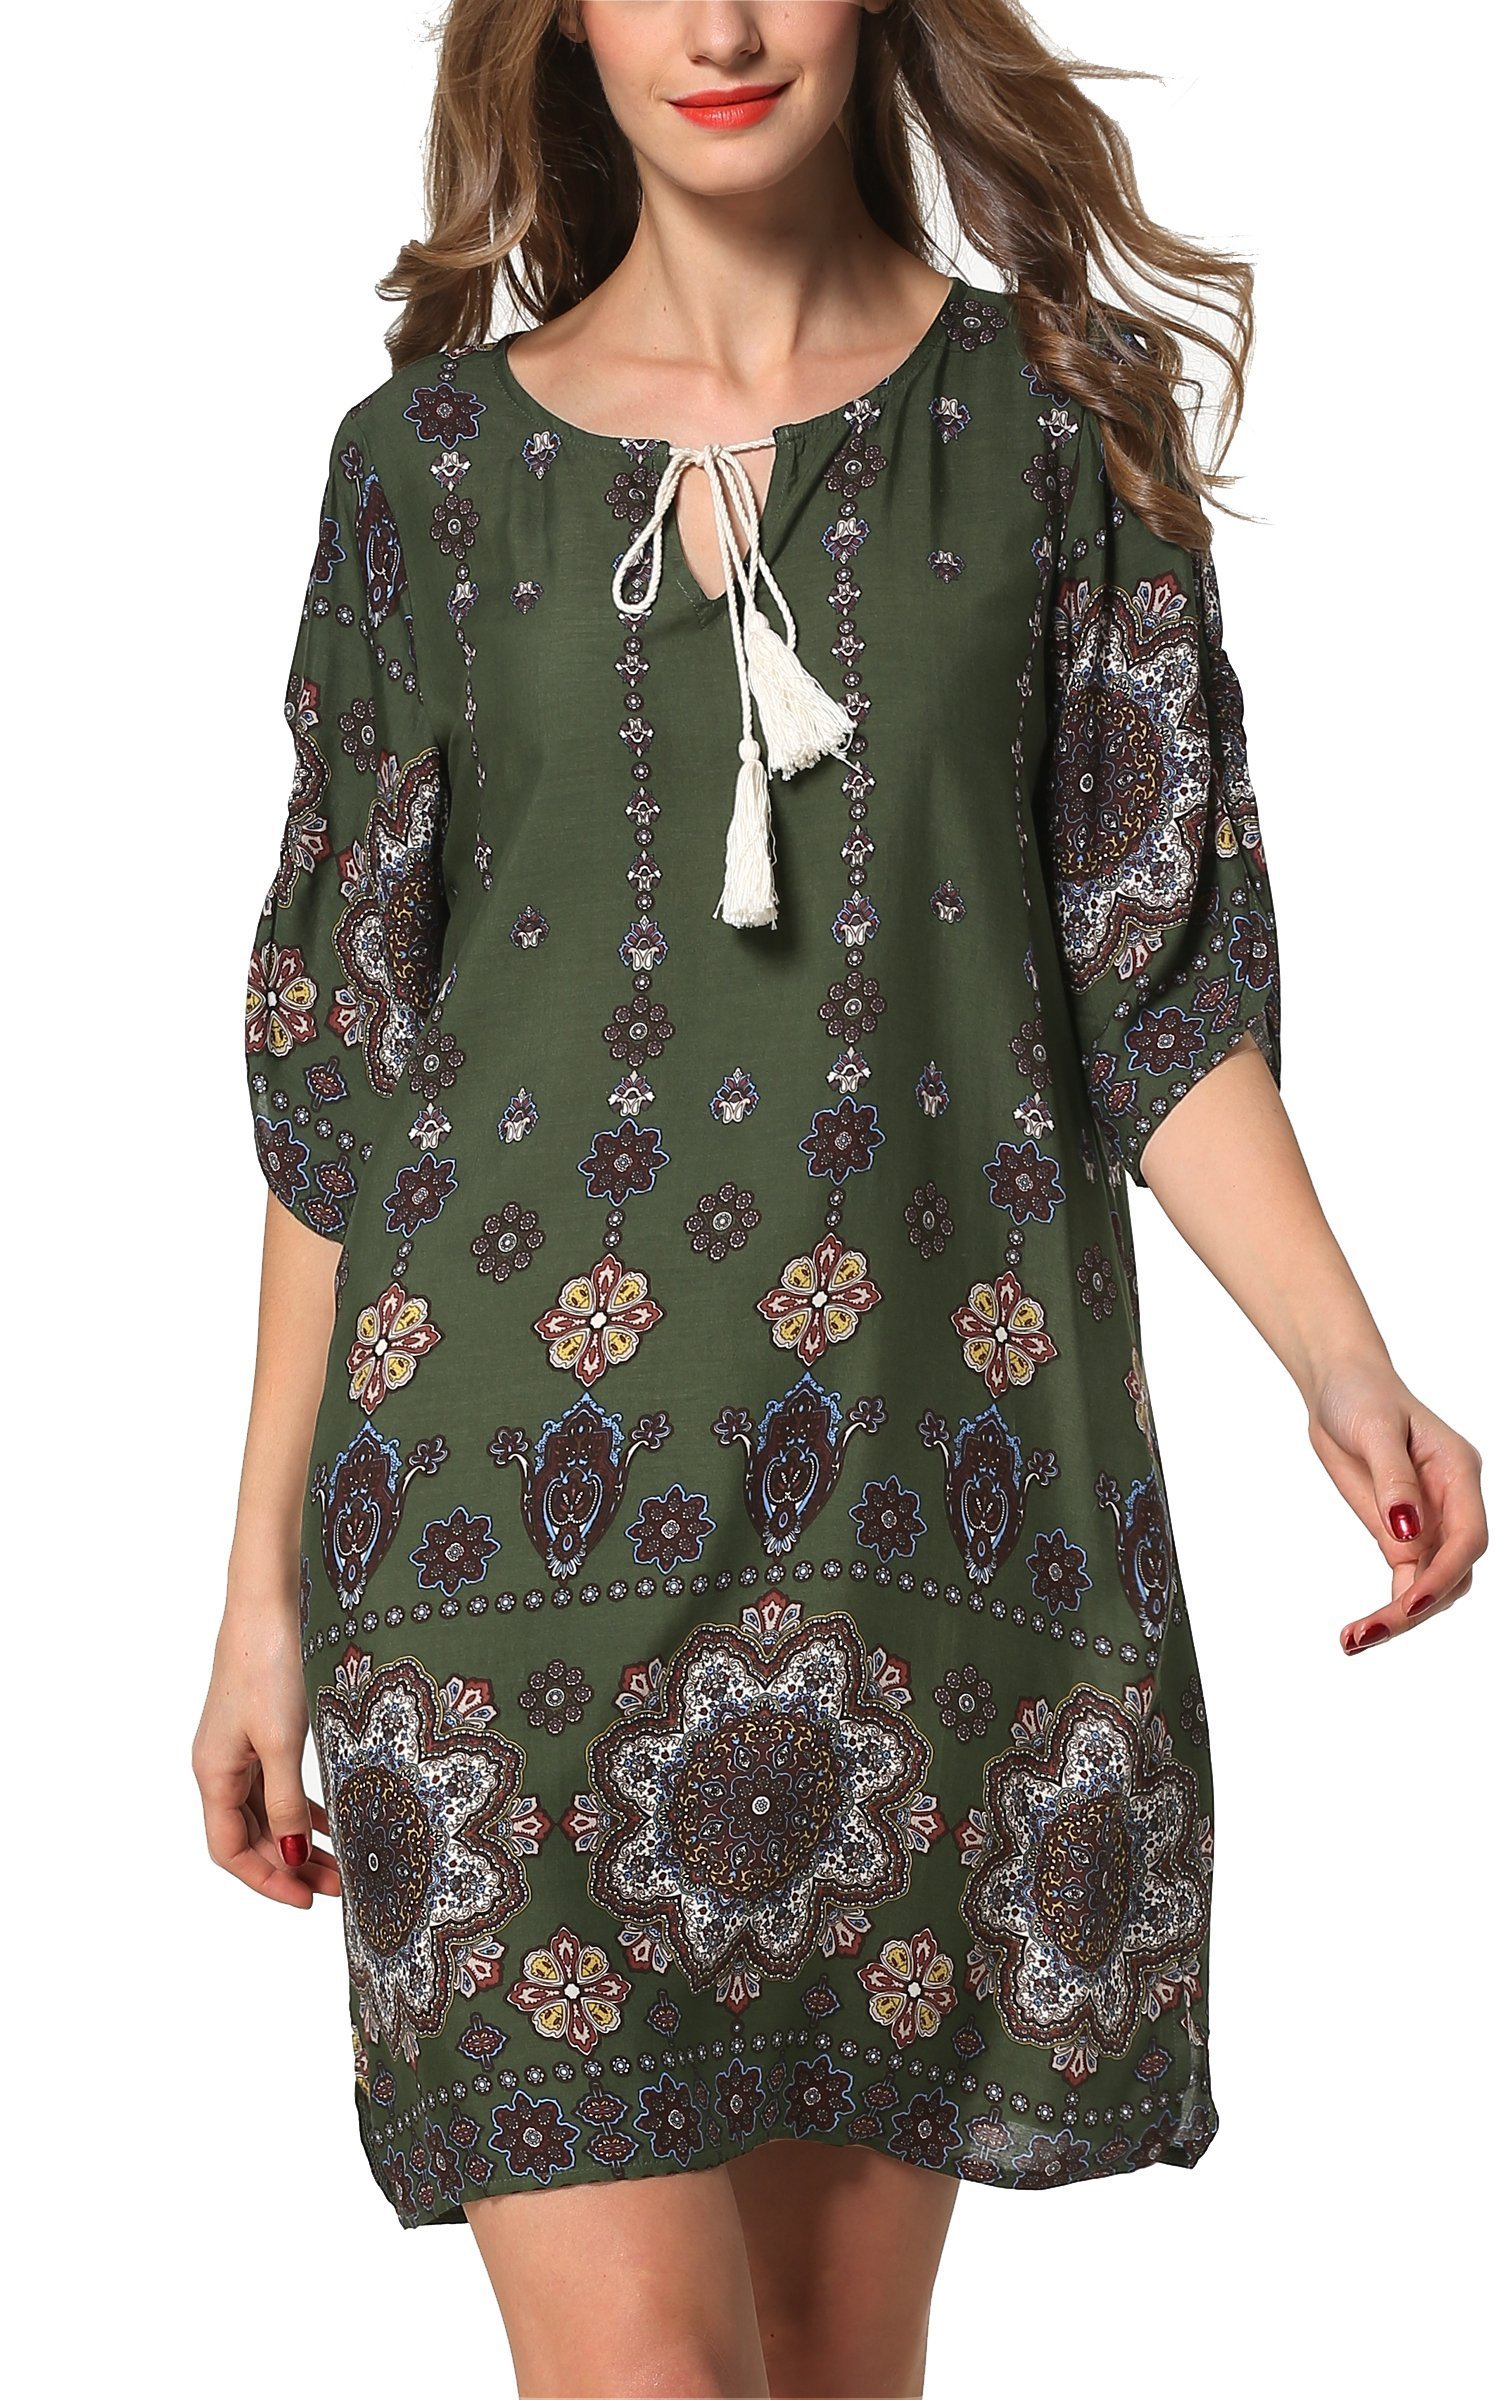 ARANEE Women Retro Print Floral Swing Boho style loose summer dresses